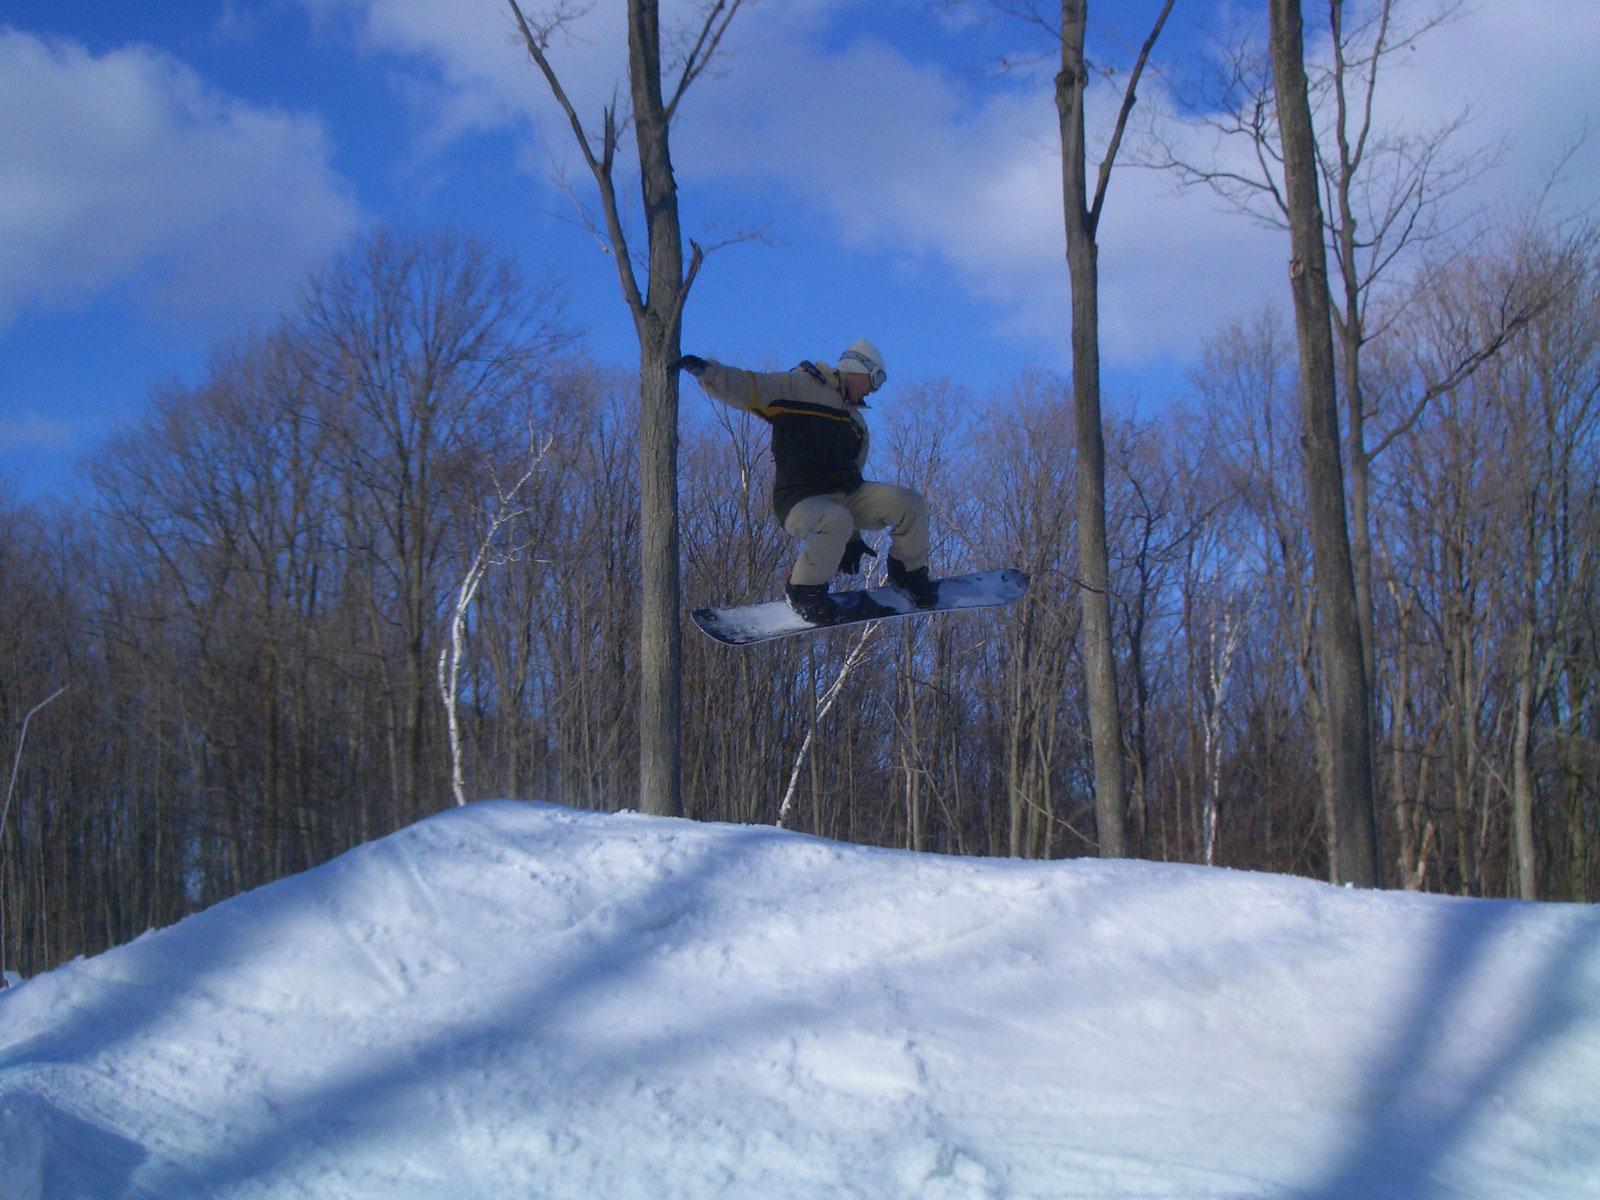 Skiing / snowboarding